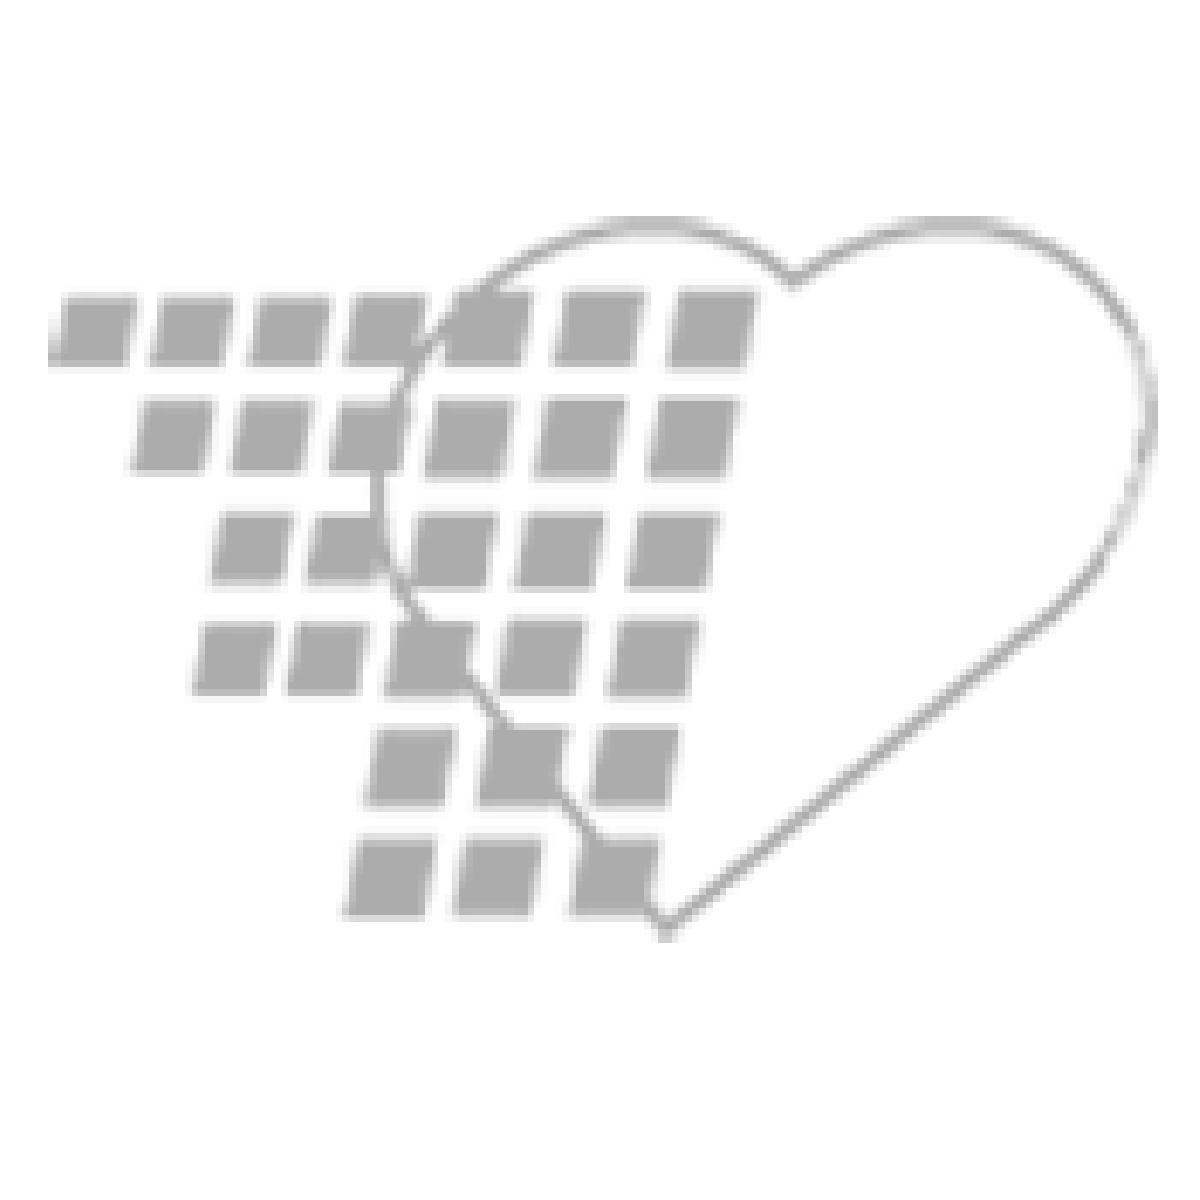 03-47-1040-SM - DermAssist® Sterile Pairs Powder-Free Latex Exam Gloves - Small